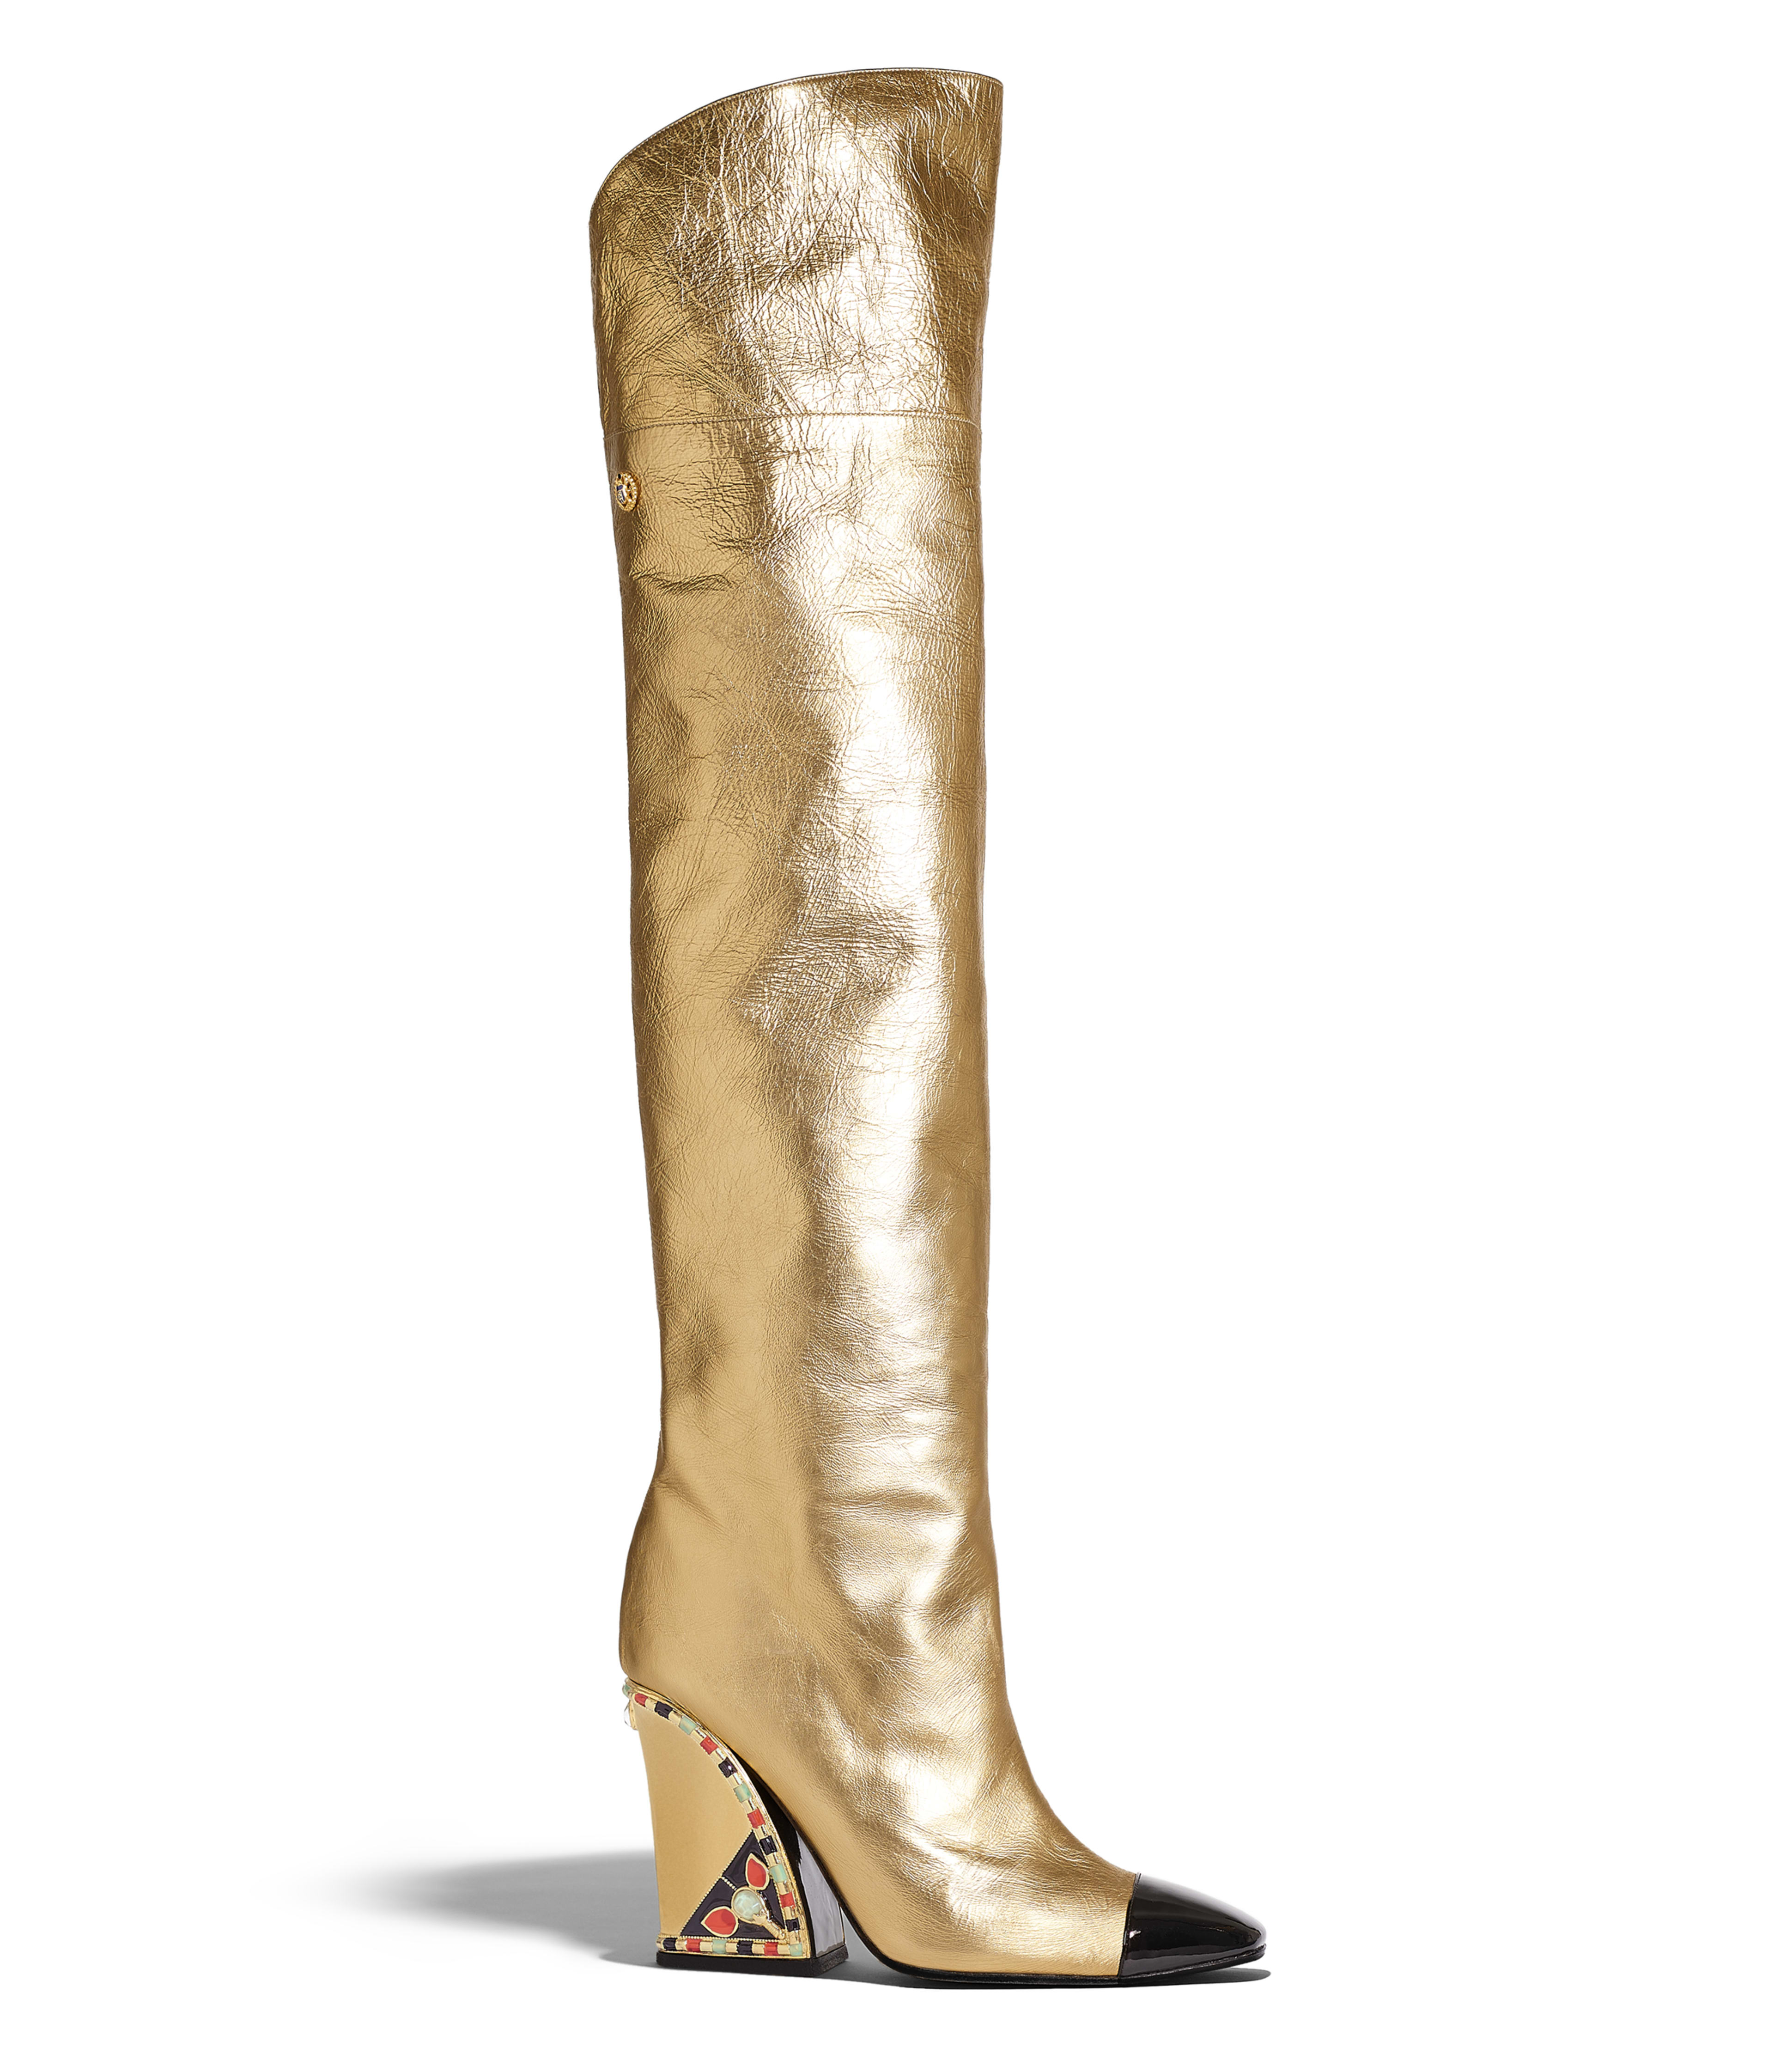 a9fb1c28e44f High Boots Laminated Lambskin & Patent Calfskin, Gold & Black Ref.  G35074Y53382C0369